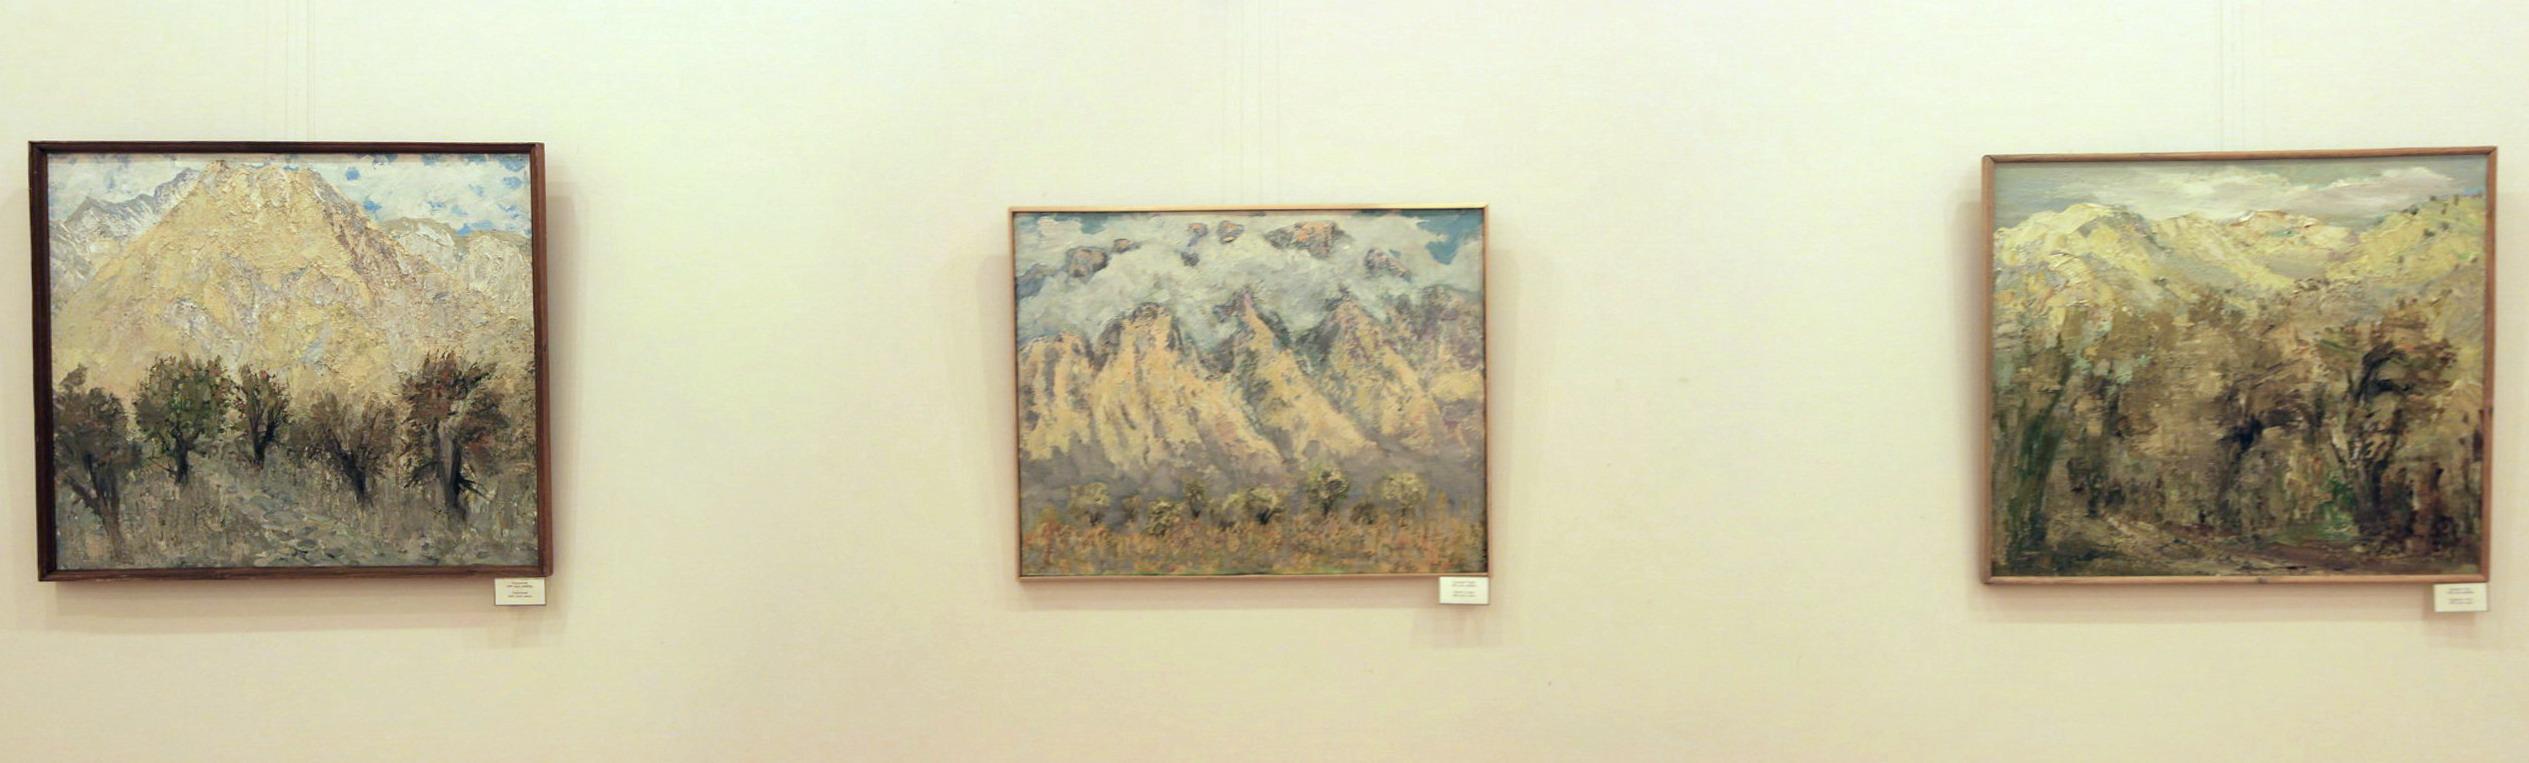 Гаглоева Римма. Экспозиция картин (6)